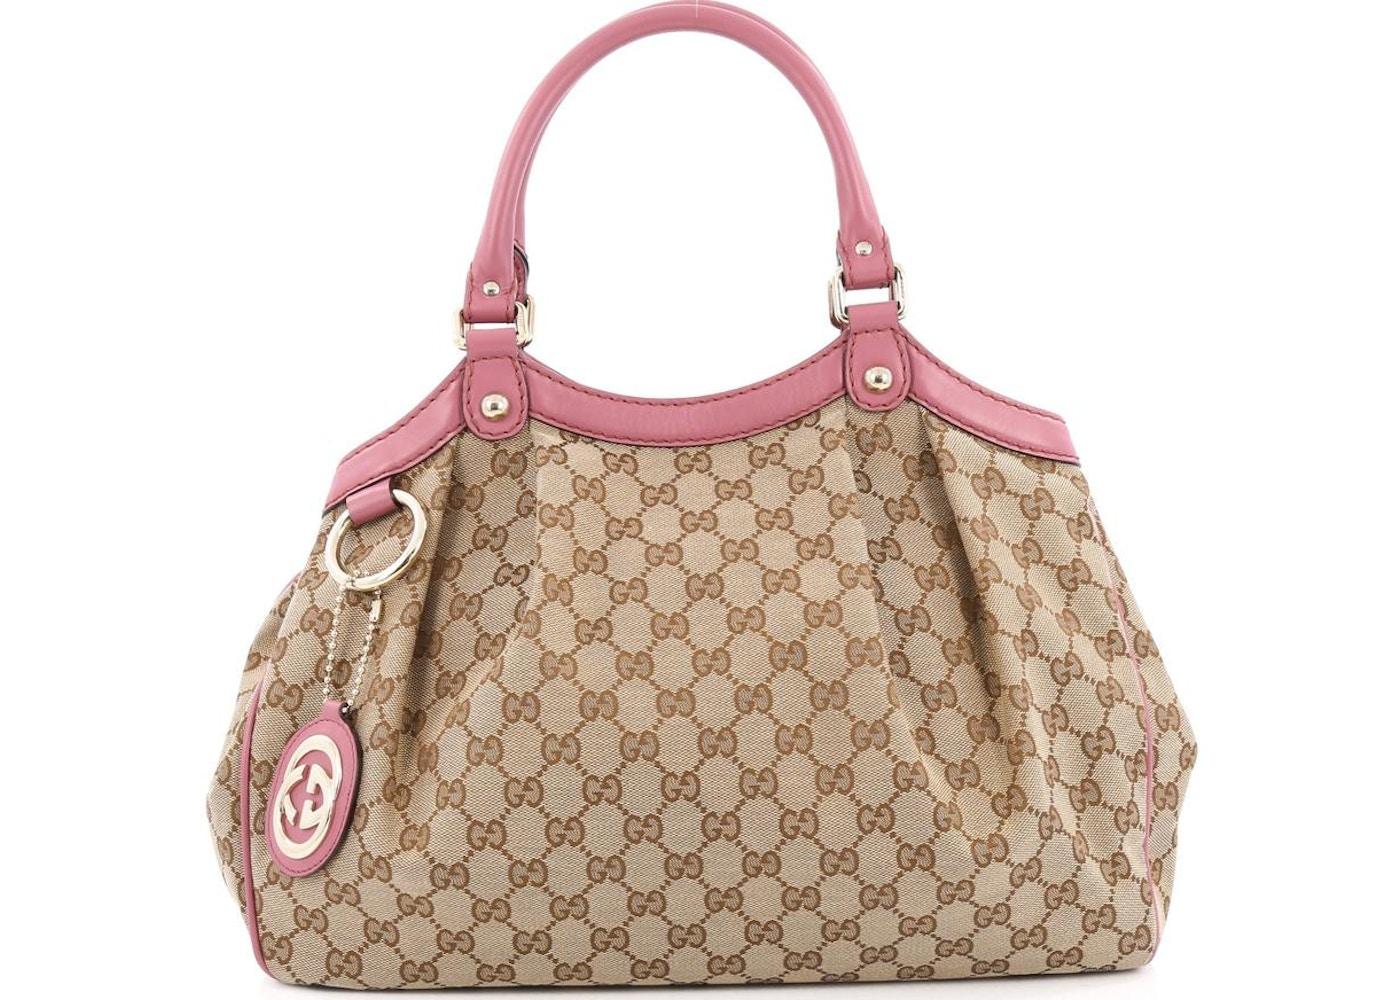 ba01113de7b Gucci Sukey Tote Diamante GG Leather Charm Medium Brown Pink